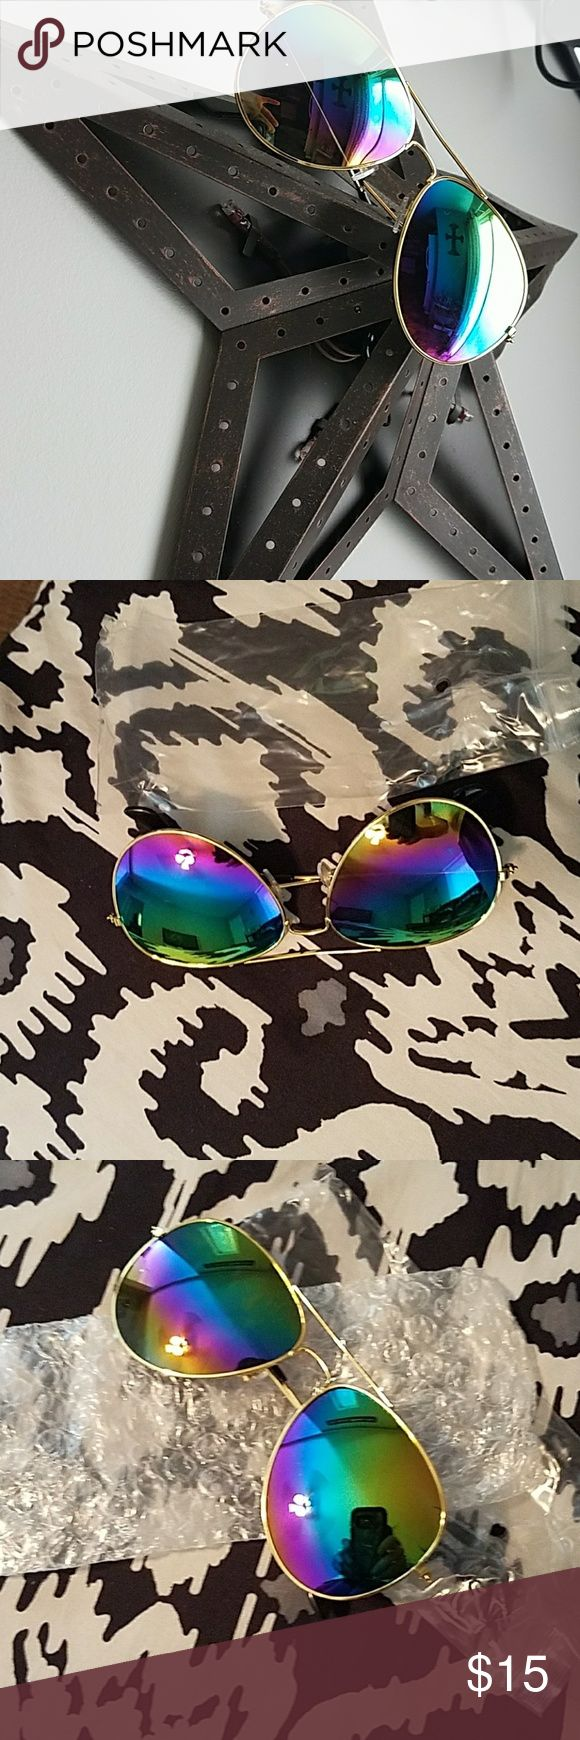 NIP anti uv sunglasses Gold framed aviator sunglasses with gorgeous rainbow lenses. Accessories Glasses